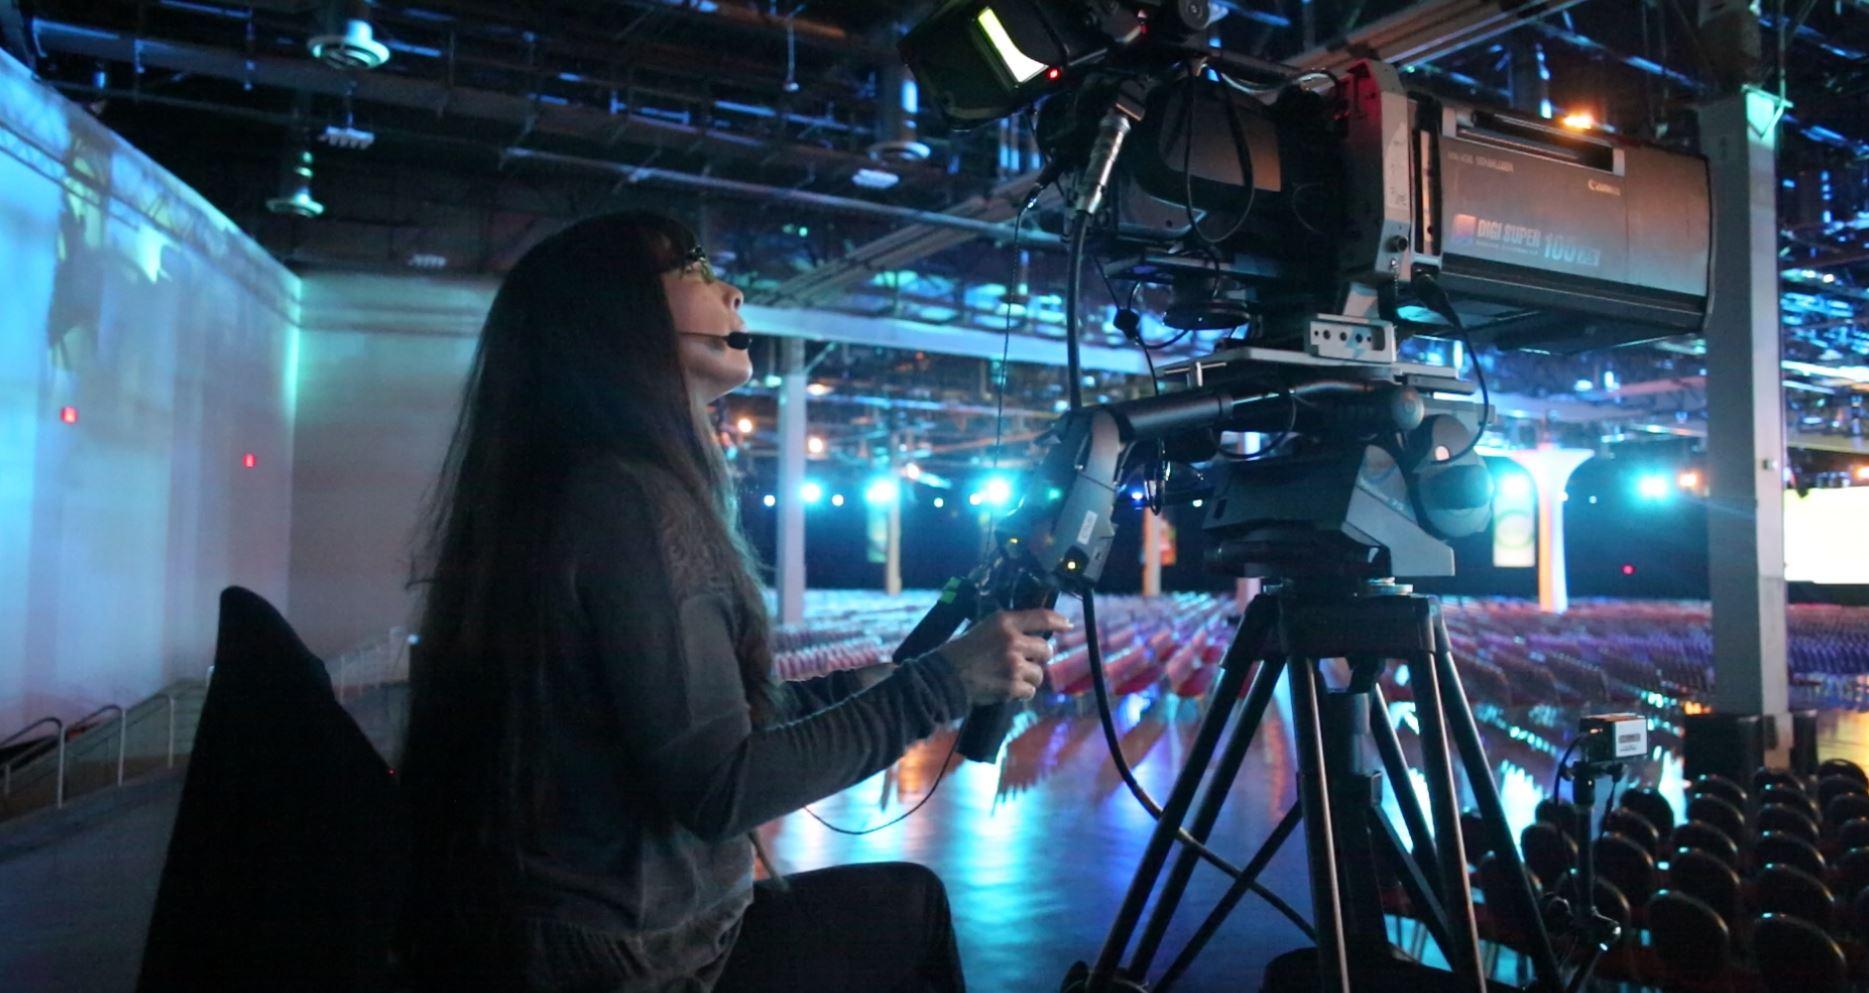 Videographer Prepping Camera Gear 145